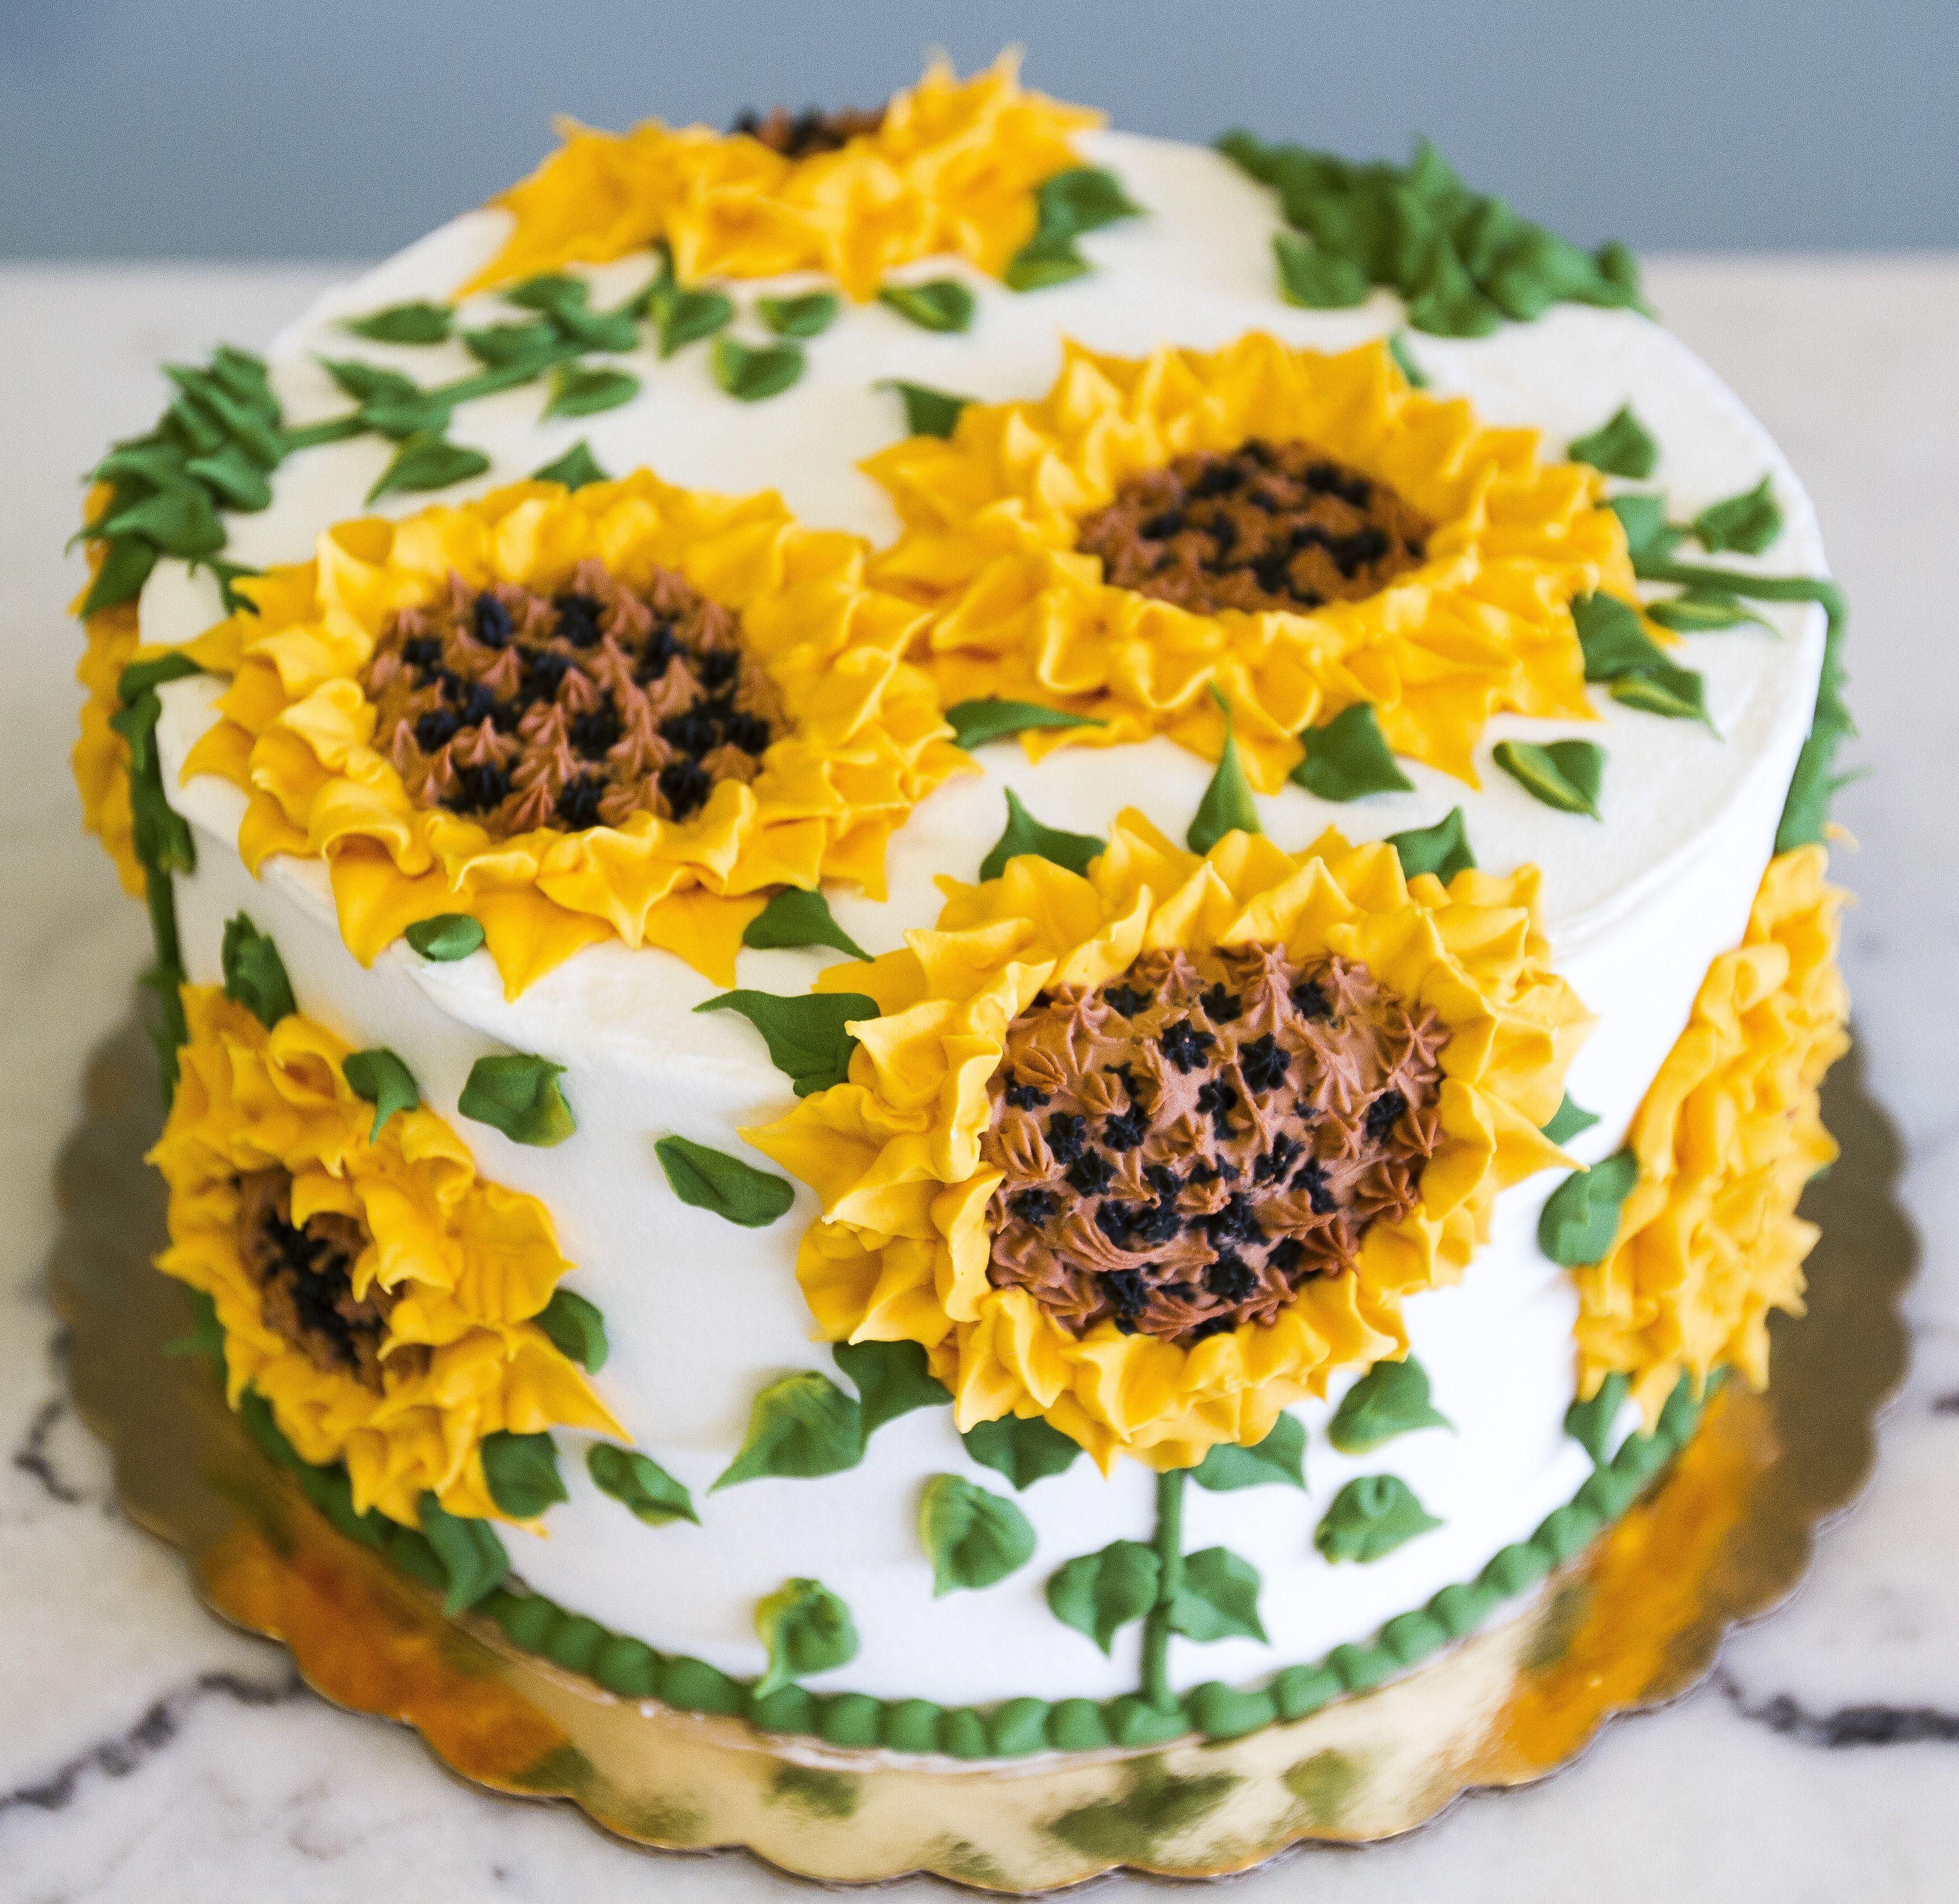 Awe Inspiring Sunflower Birthday Cake Cake 103 With Images Sunflower Funny Birthday Cards Online Necthendildamsfinfo